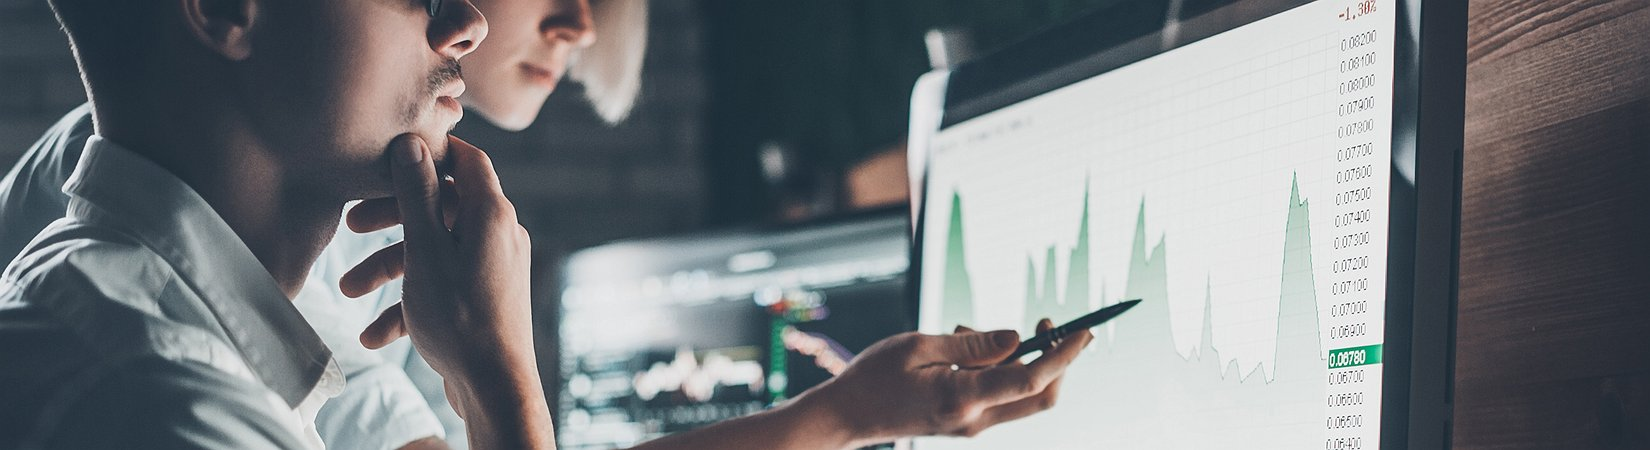 Анализ рынка криптовалют 30.01.2018